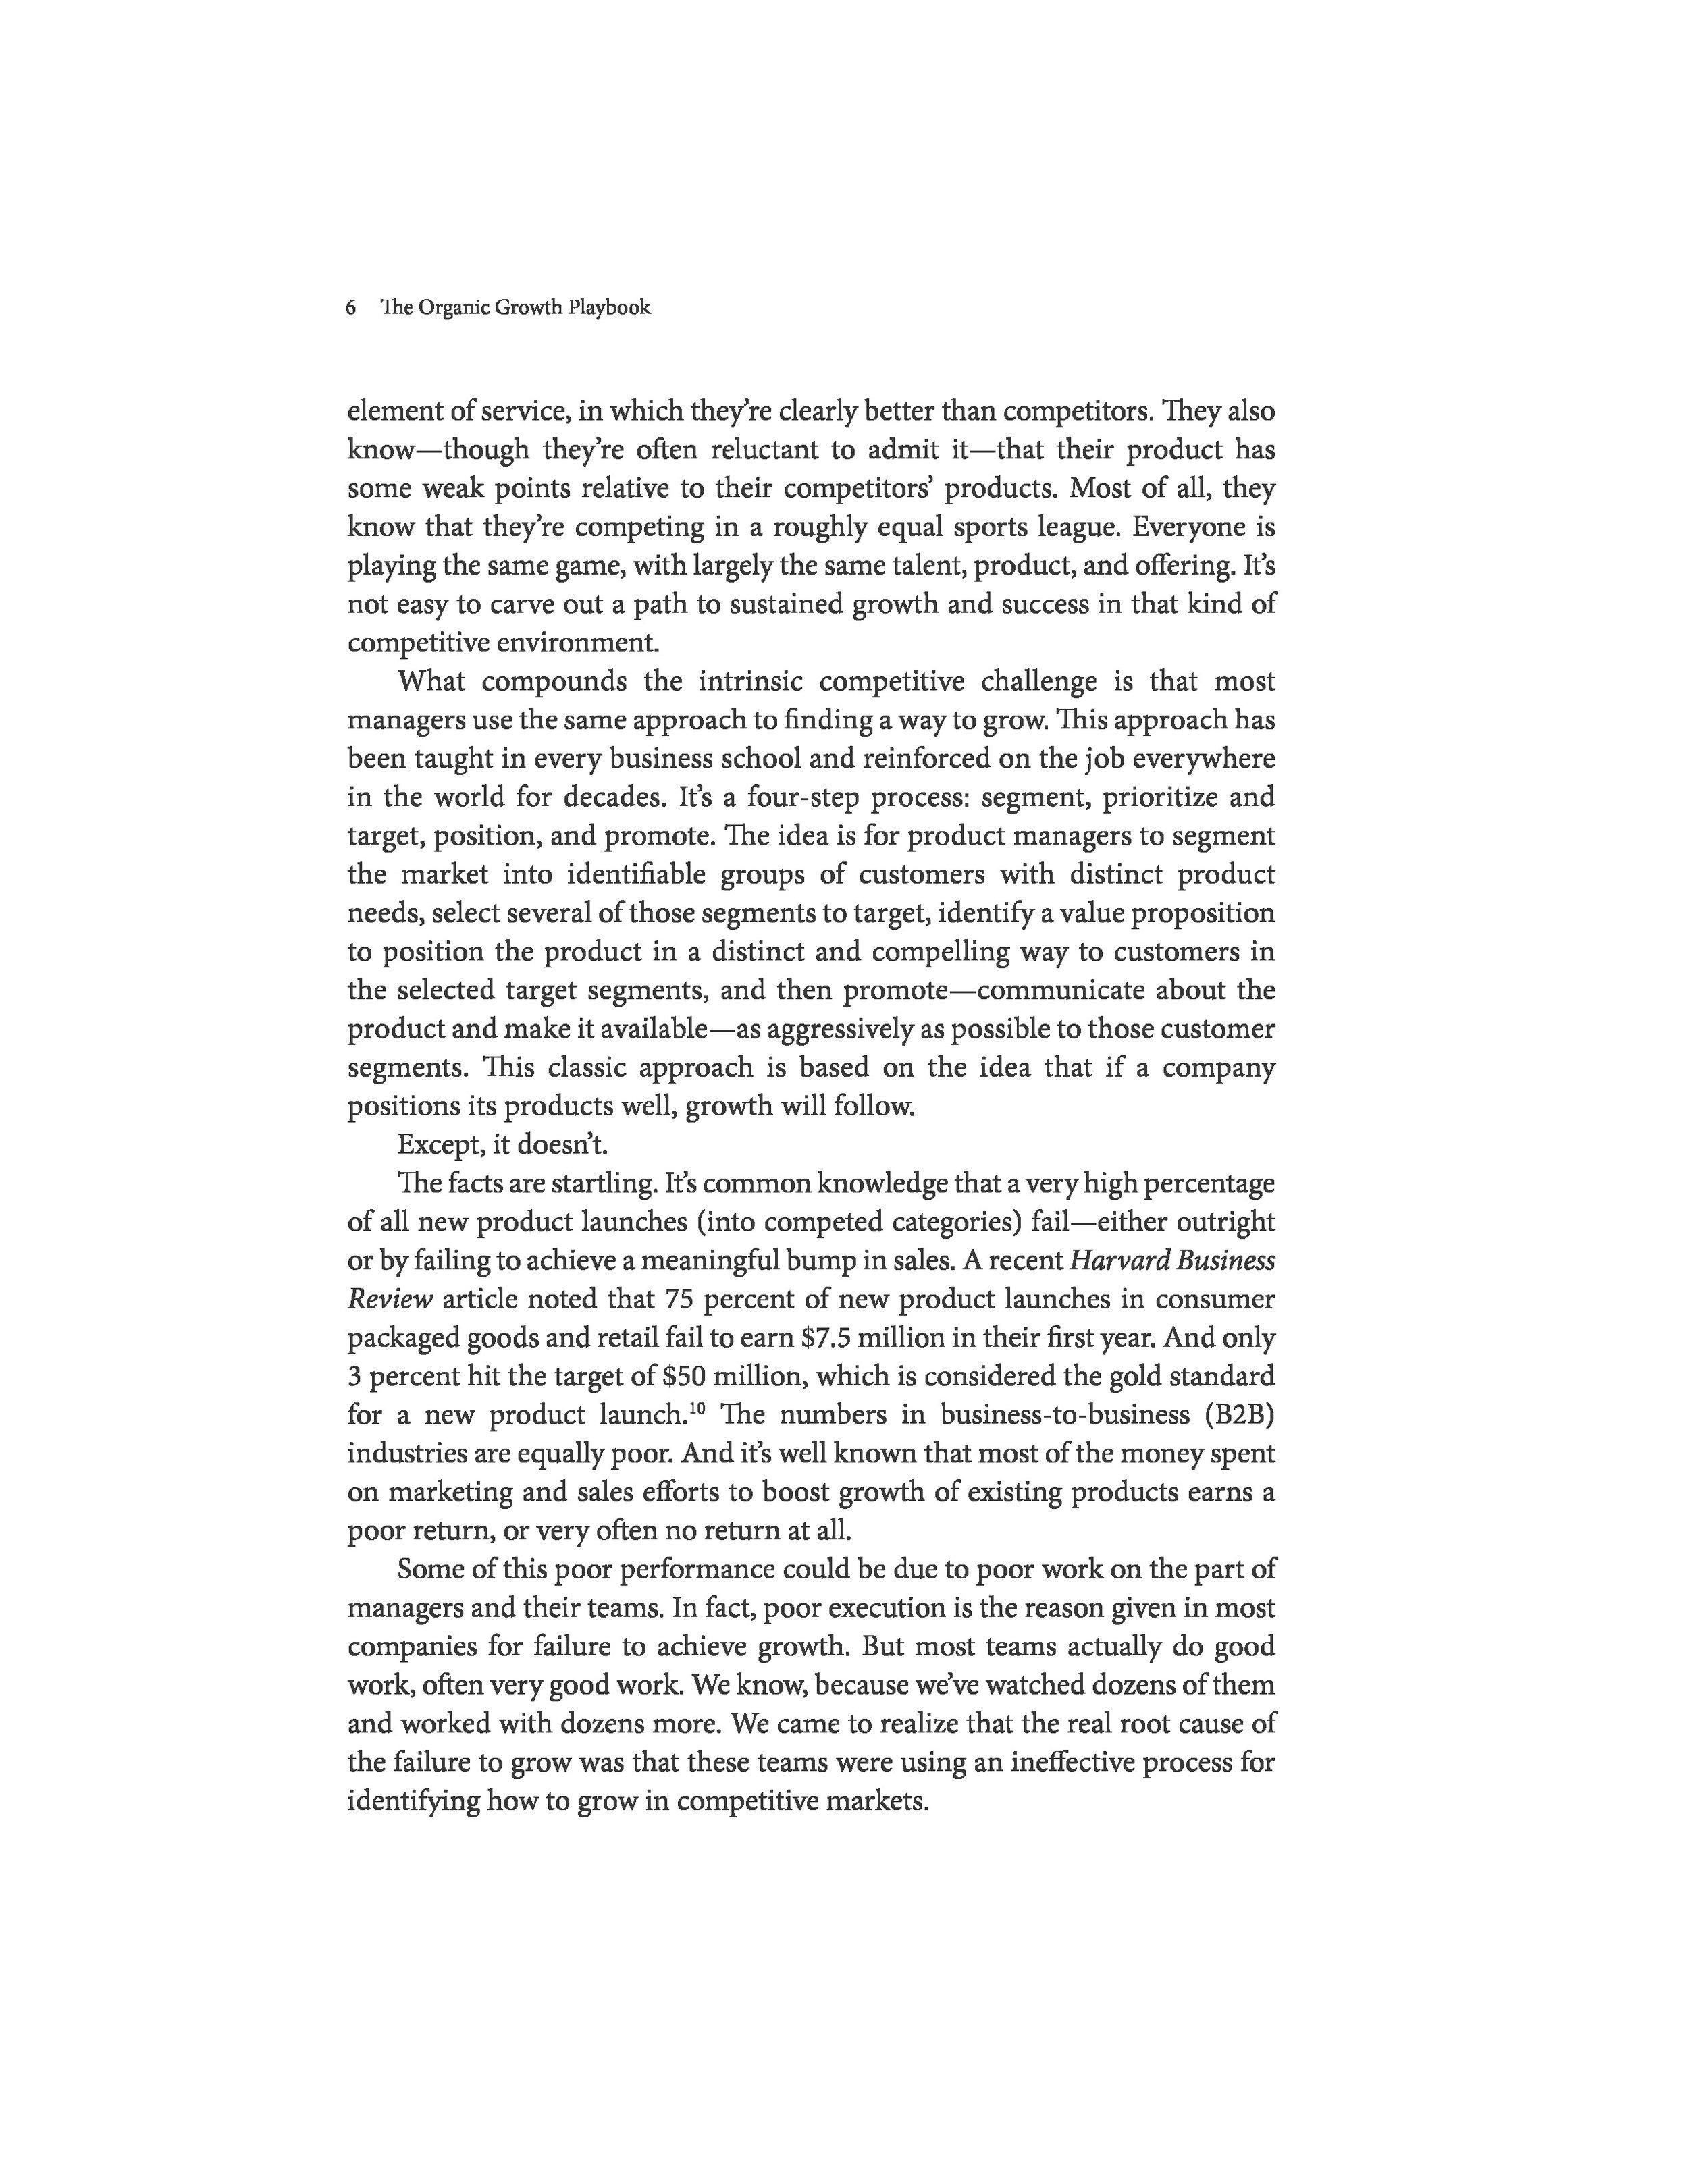 OGP excerpt-page-5.jpg